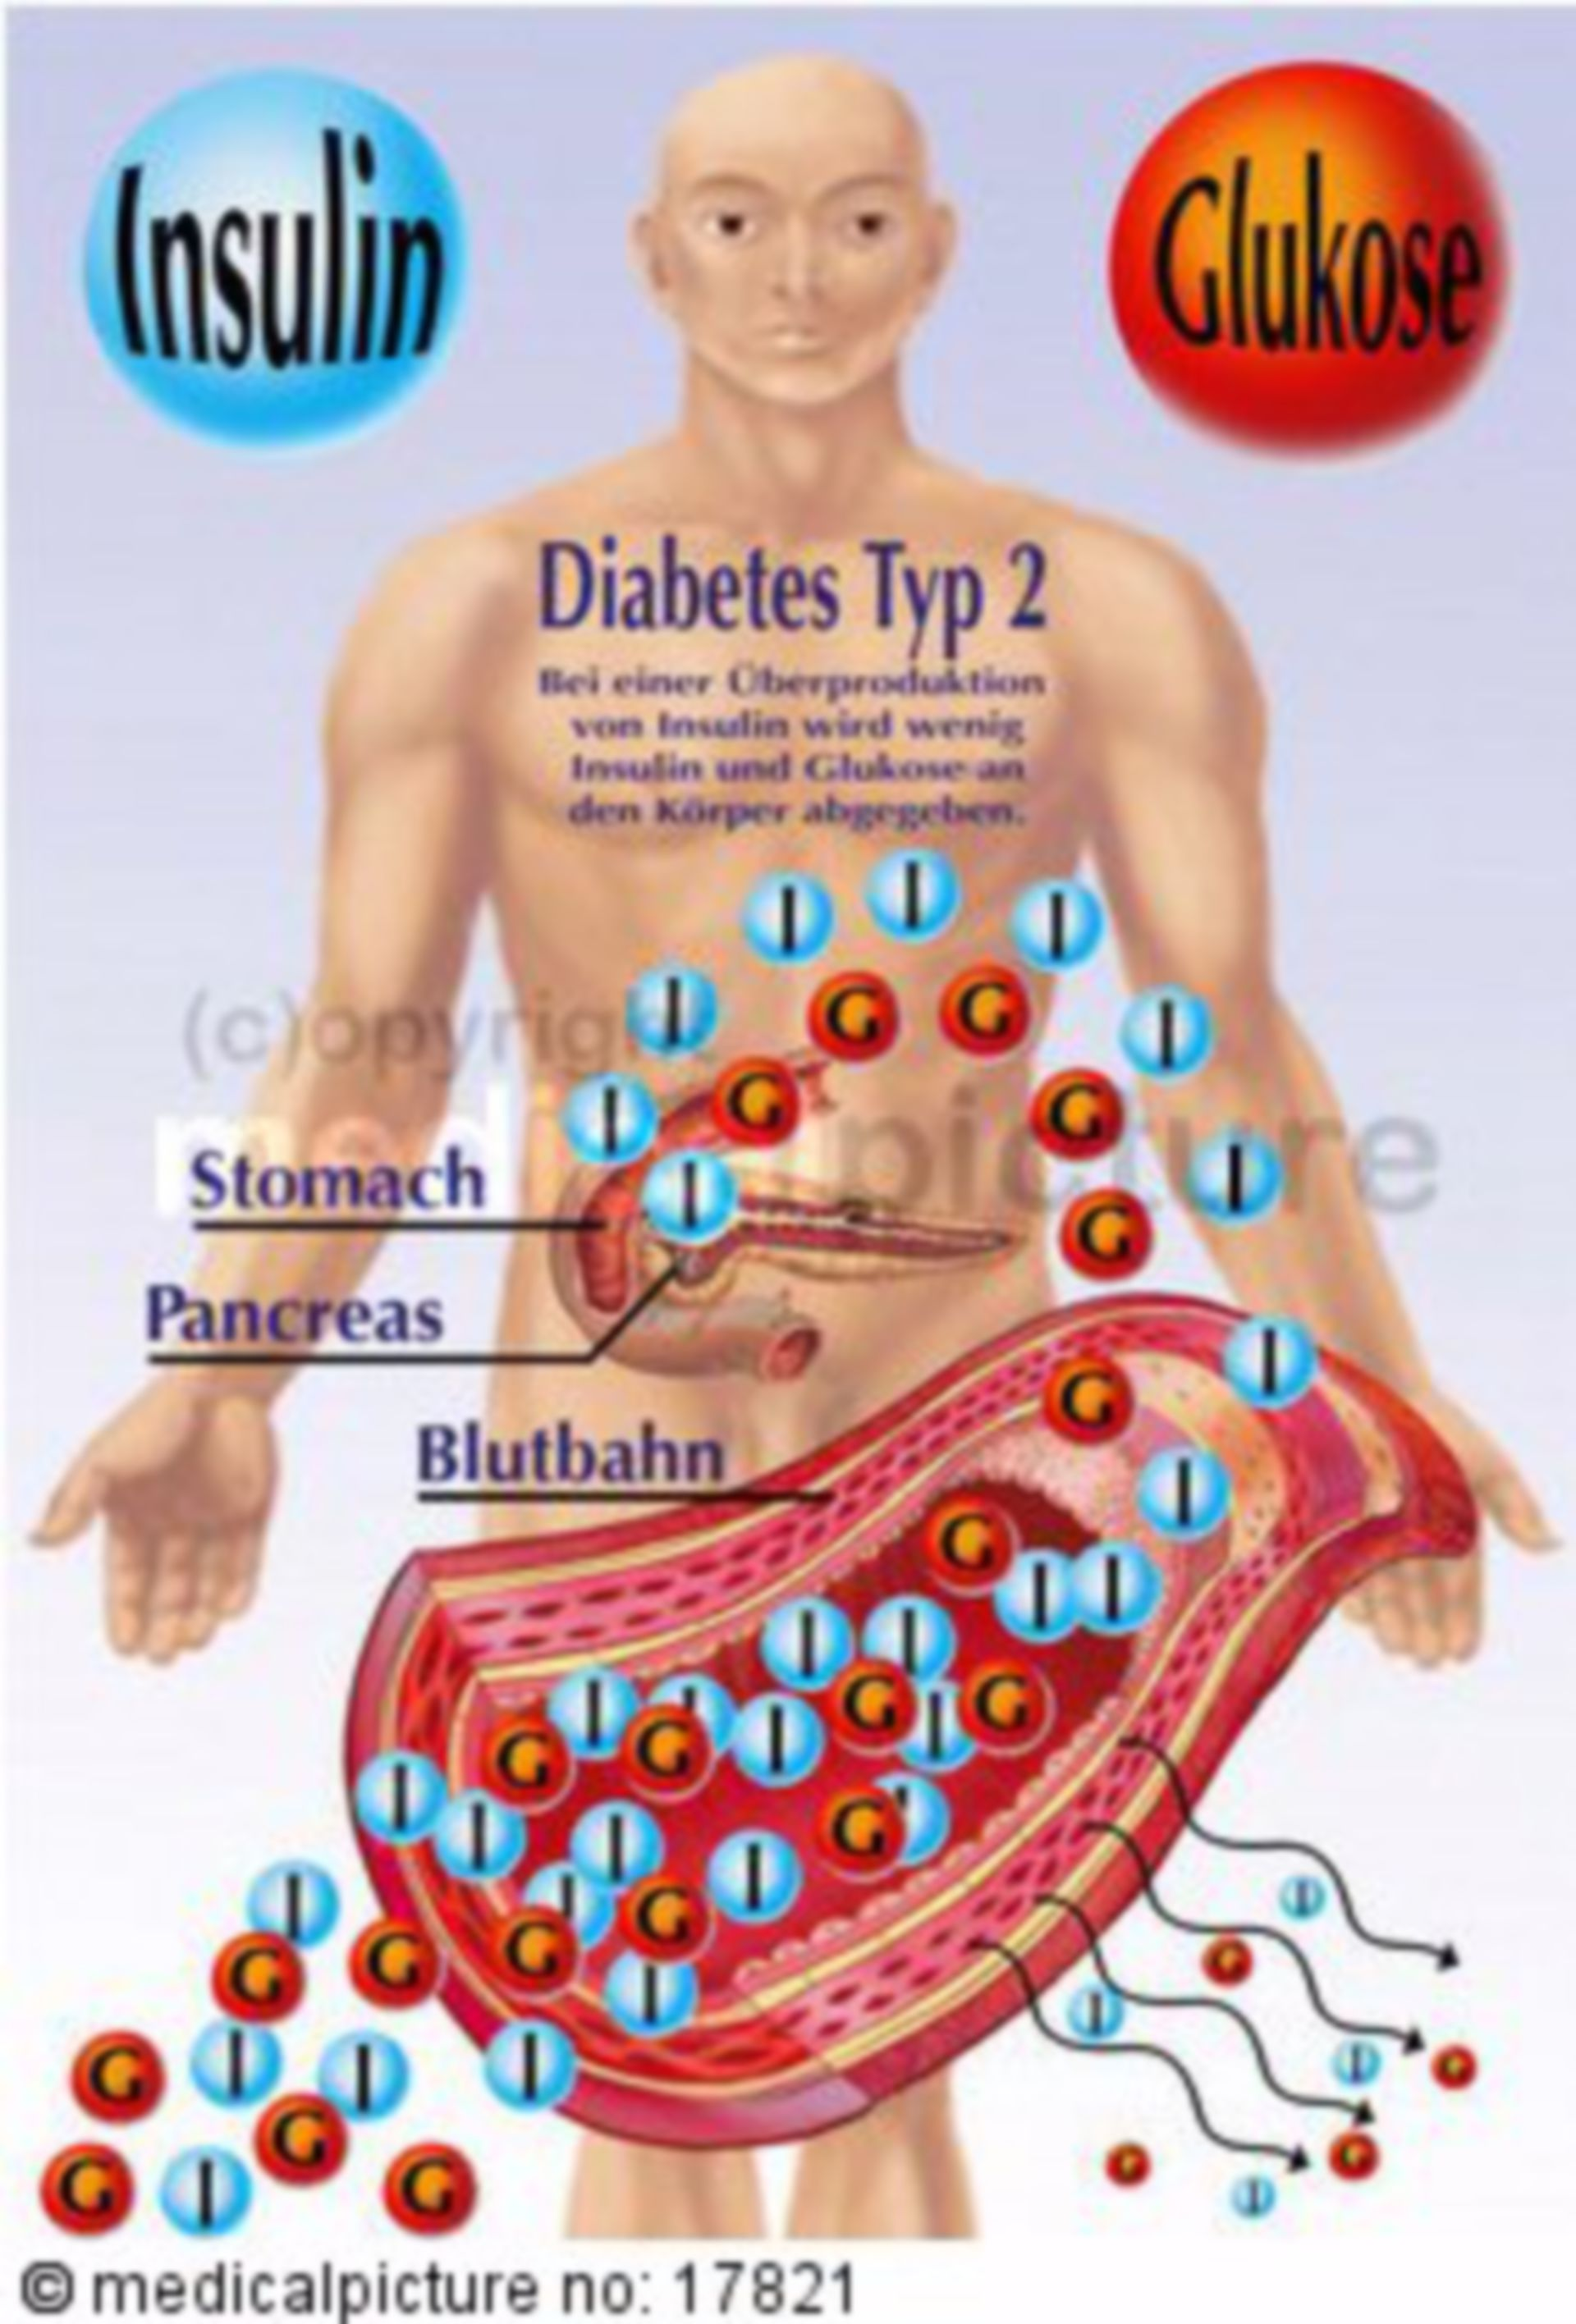 Insulin Secretion with Type-2 Diabetes